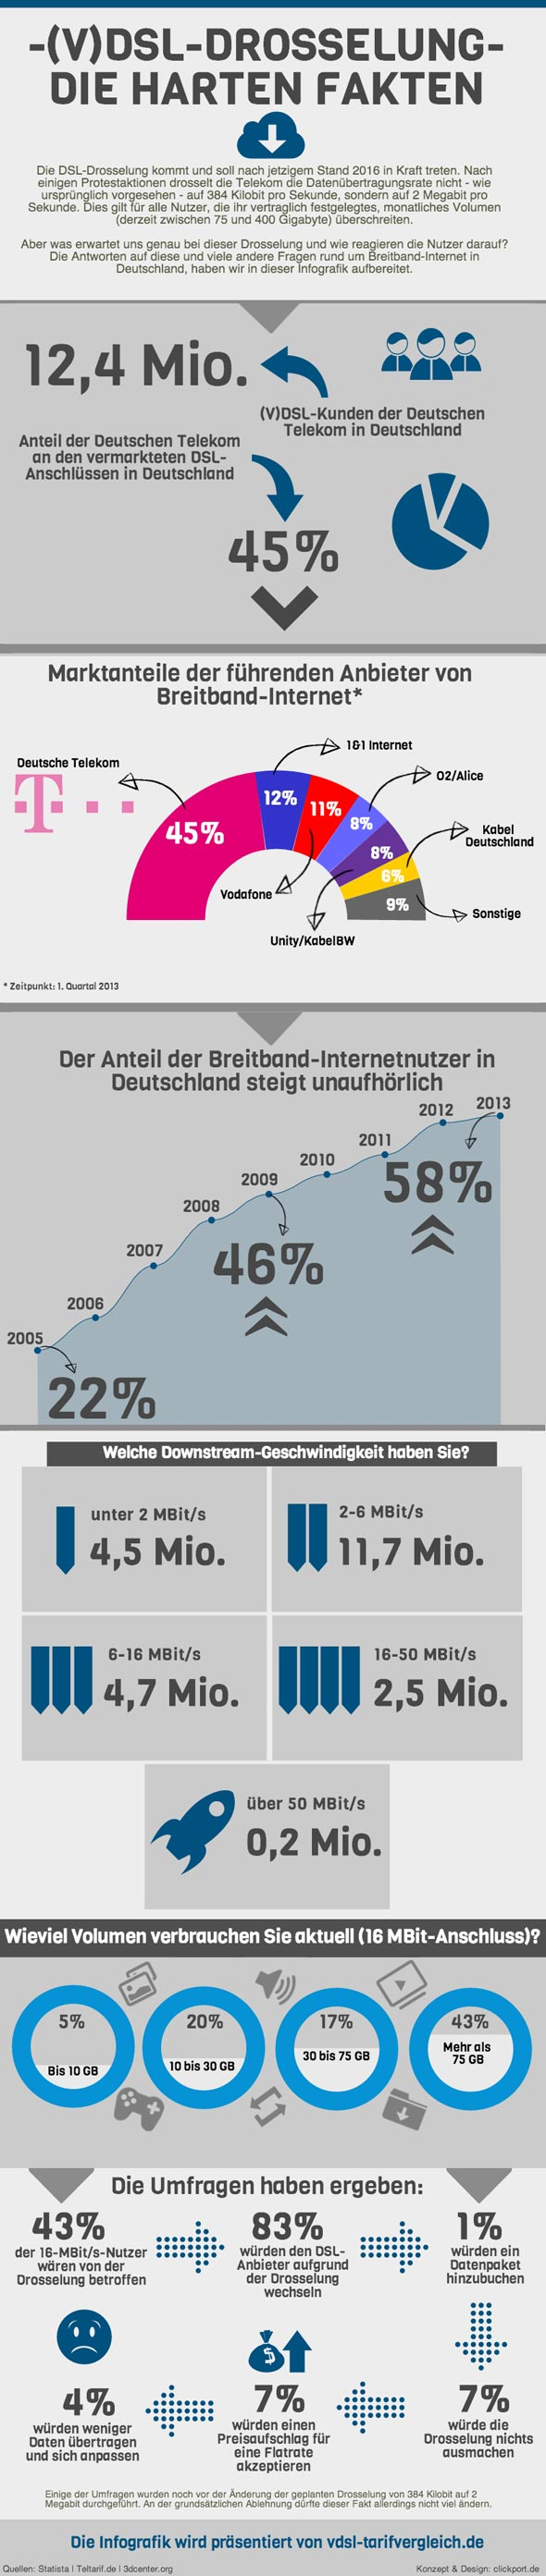 Drosselung Infografik